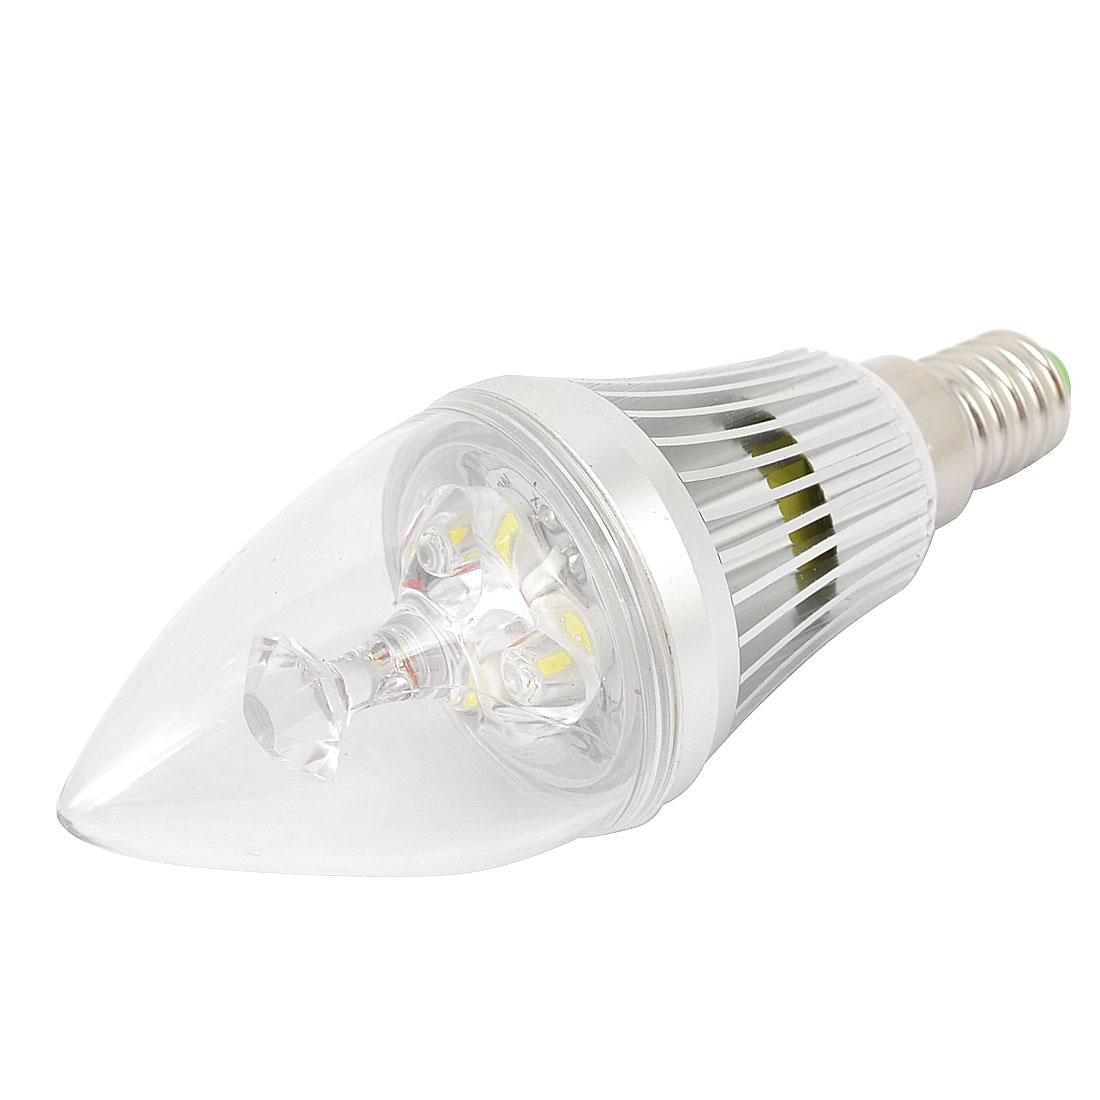 AC 85-265V E14 Socket 3 LEDs White Light Olive Shaped Candle Light Bulb 3W